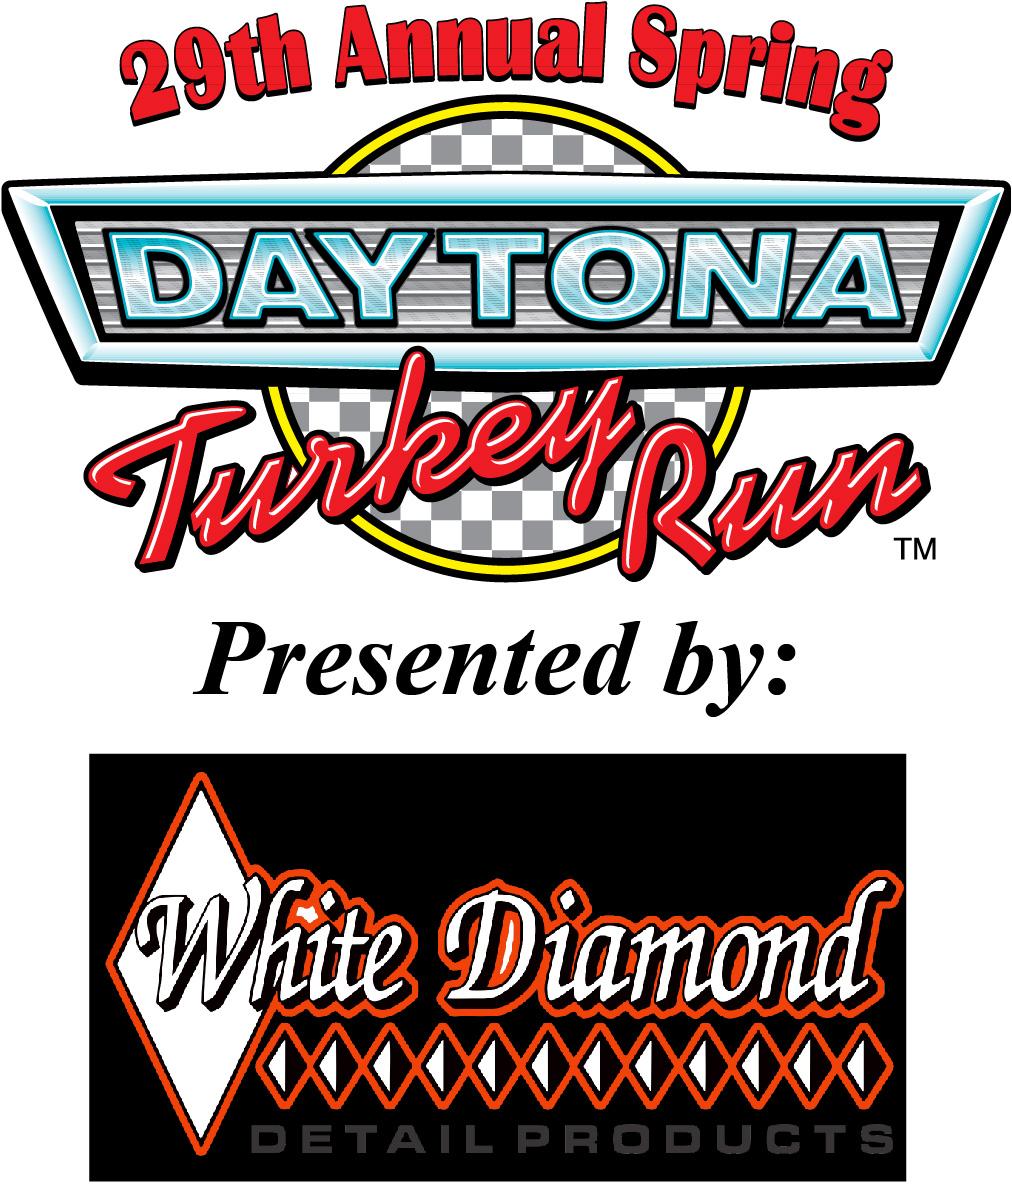 Tickets For Th Spring Daytona Turkey Run In Daytona Beach From - Daytona spring car show 2018